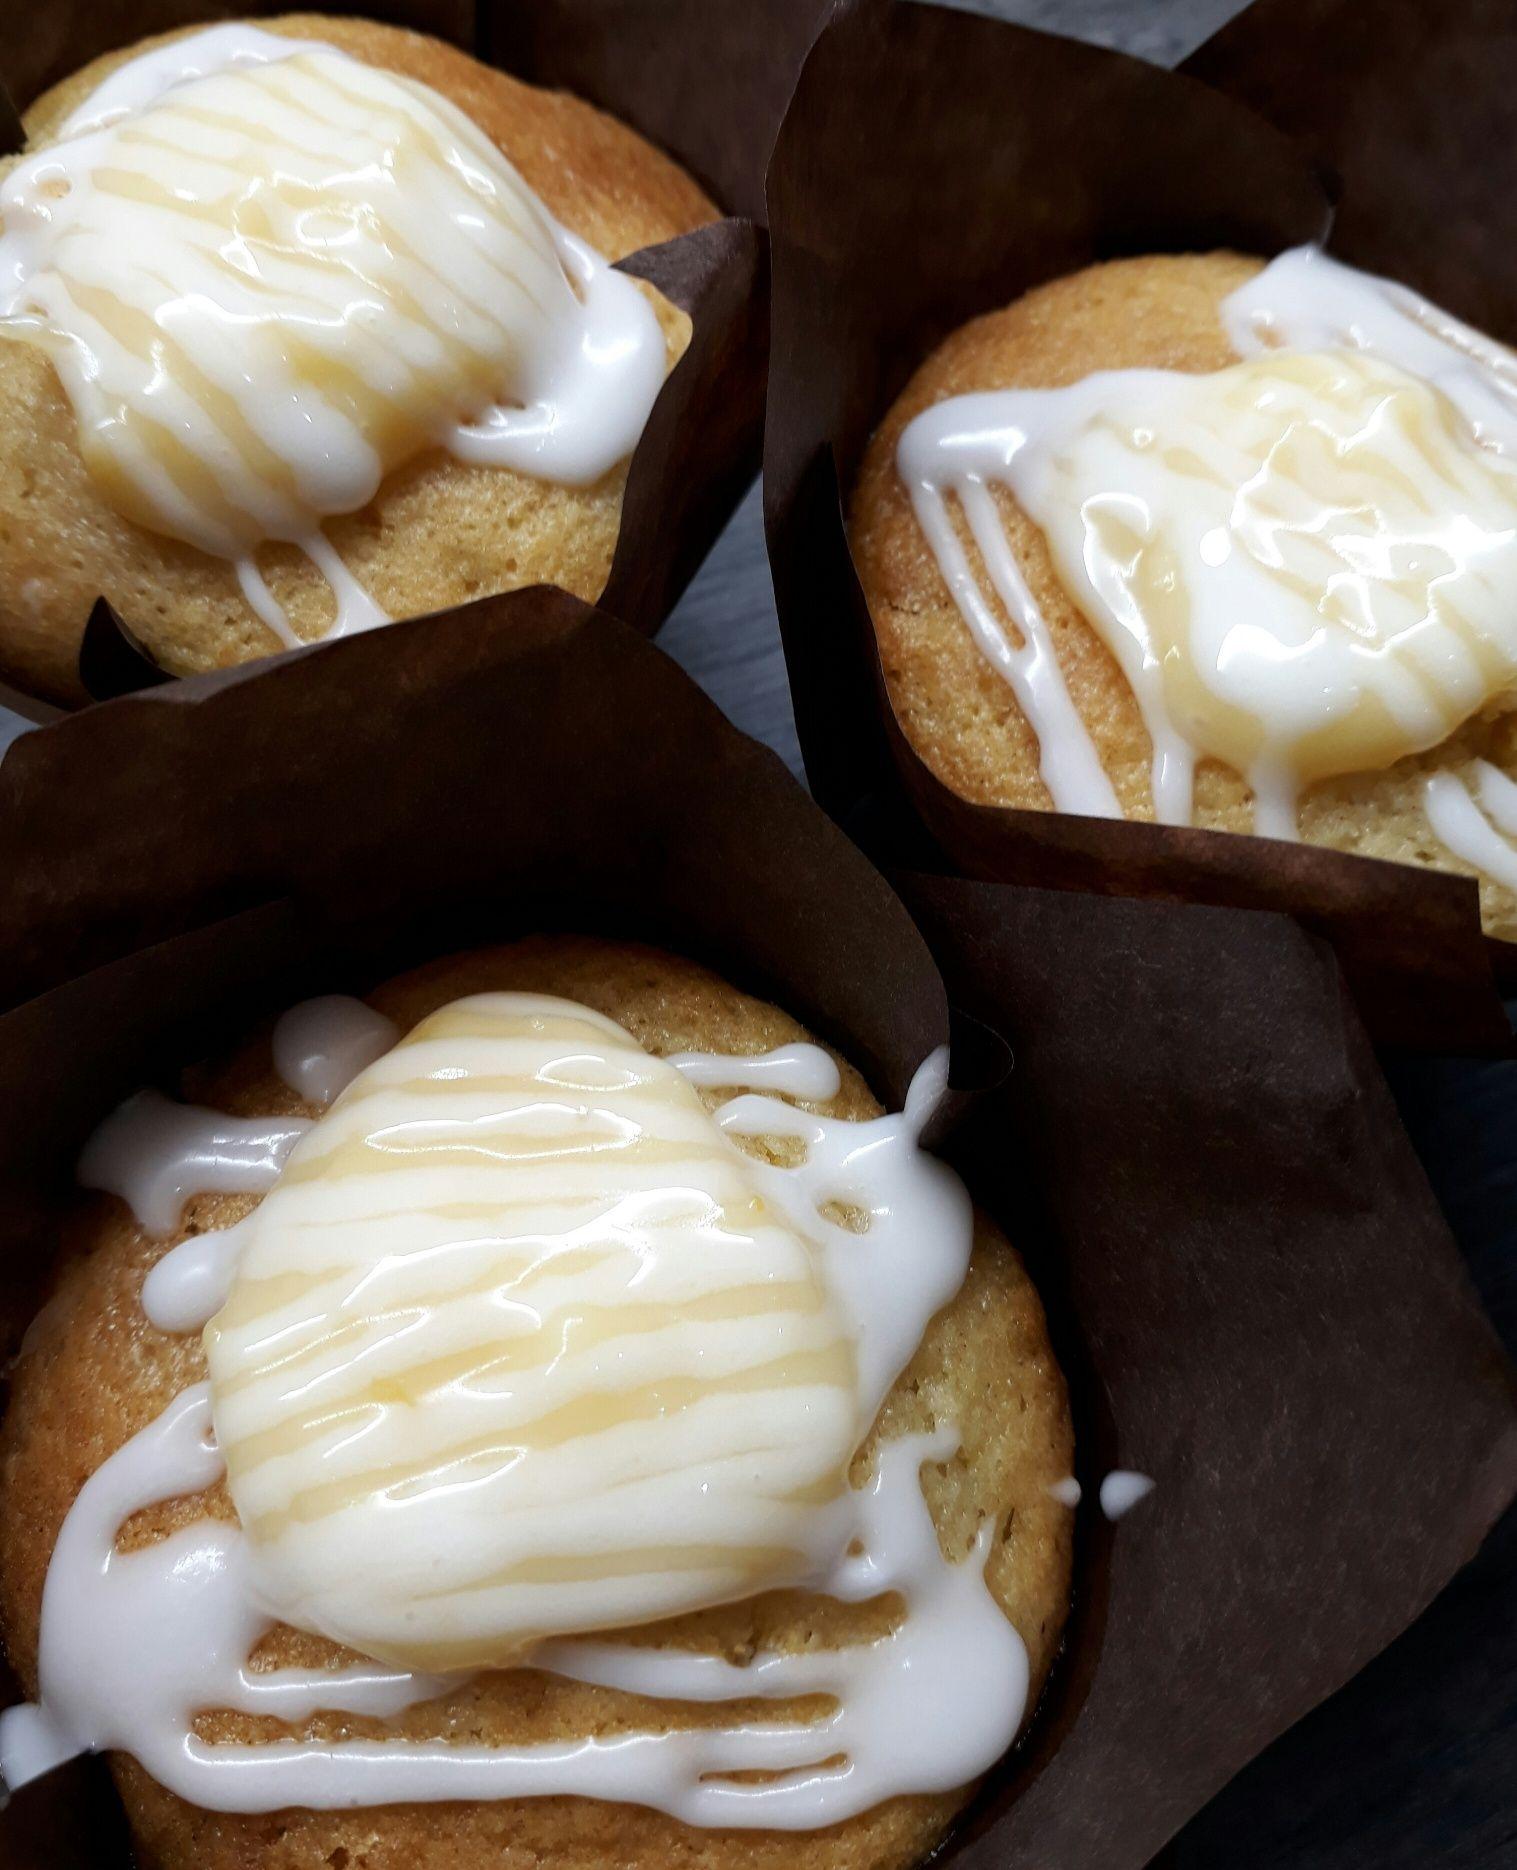 Lemon Muffins filled with Lemon Curd